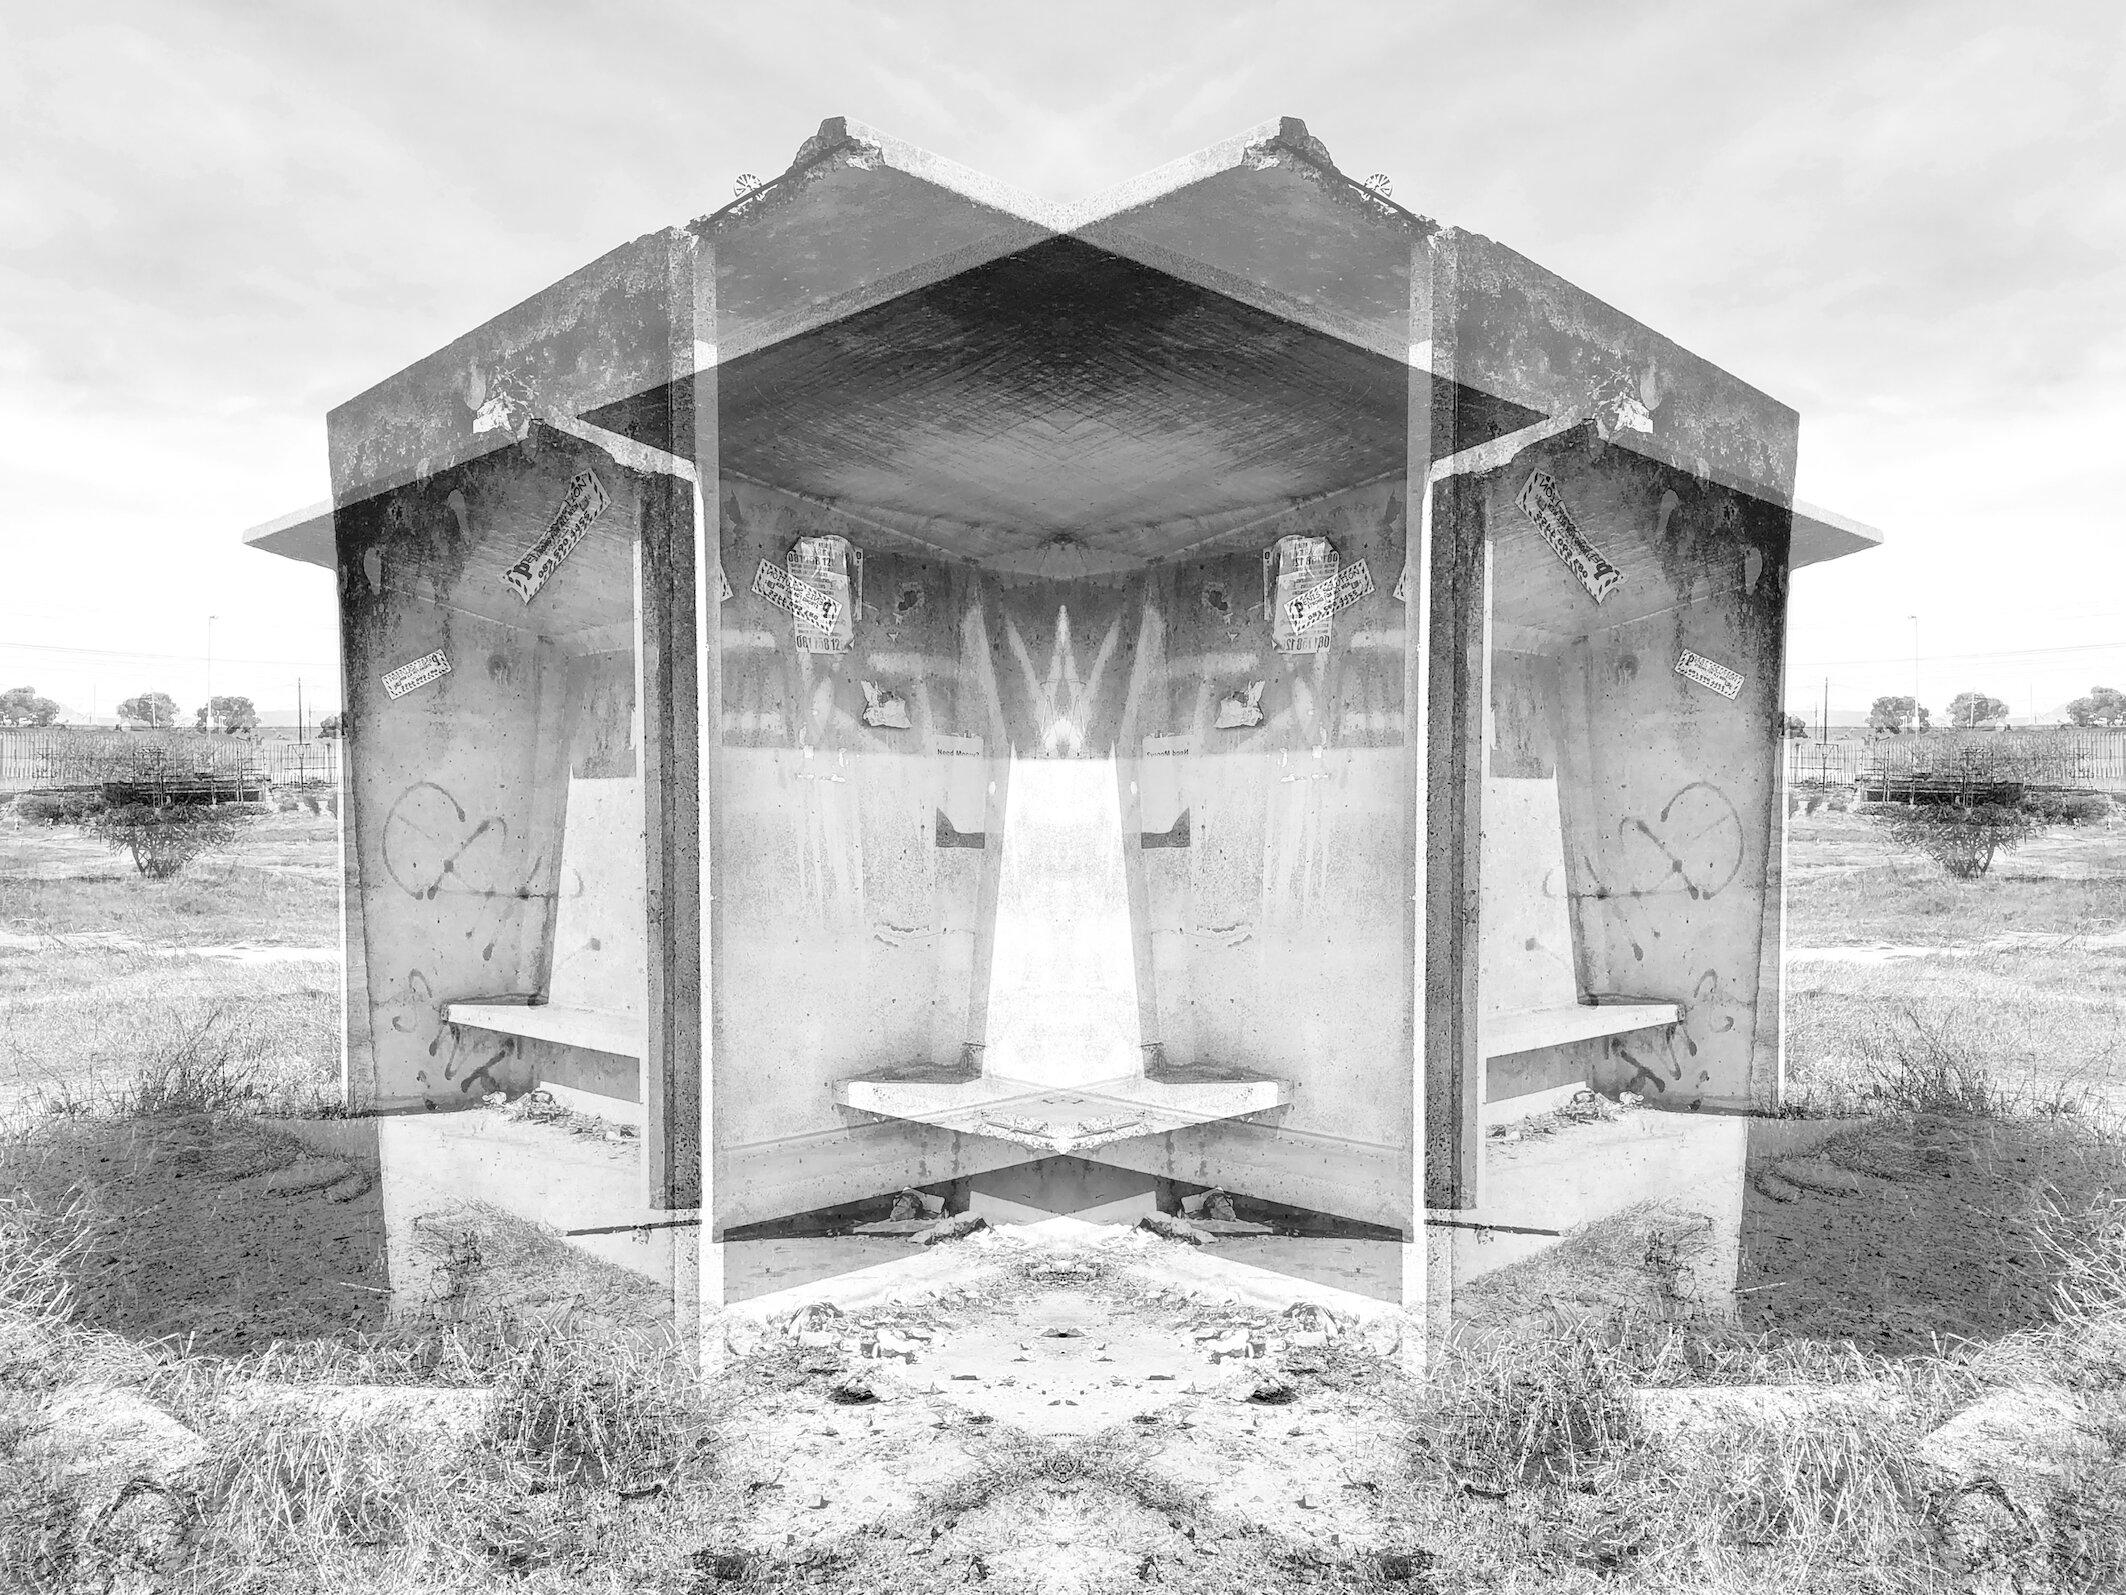 Bus shelter, Bonteheuwel, 2019  © Alastair Whitton